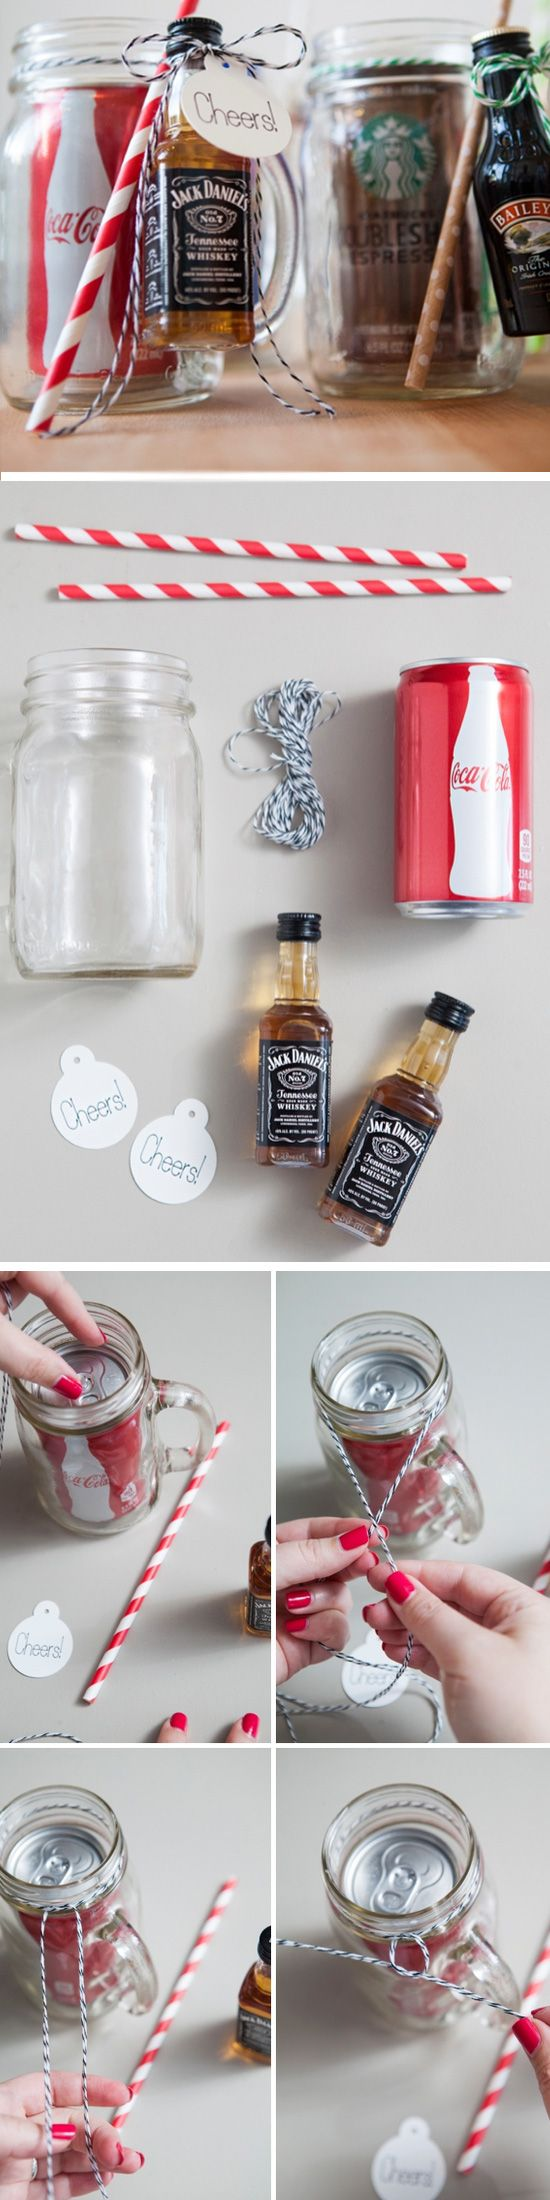 22 DIY Valentine Gifts in a Jar | tina | Pinterest | Cocktails ...